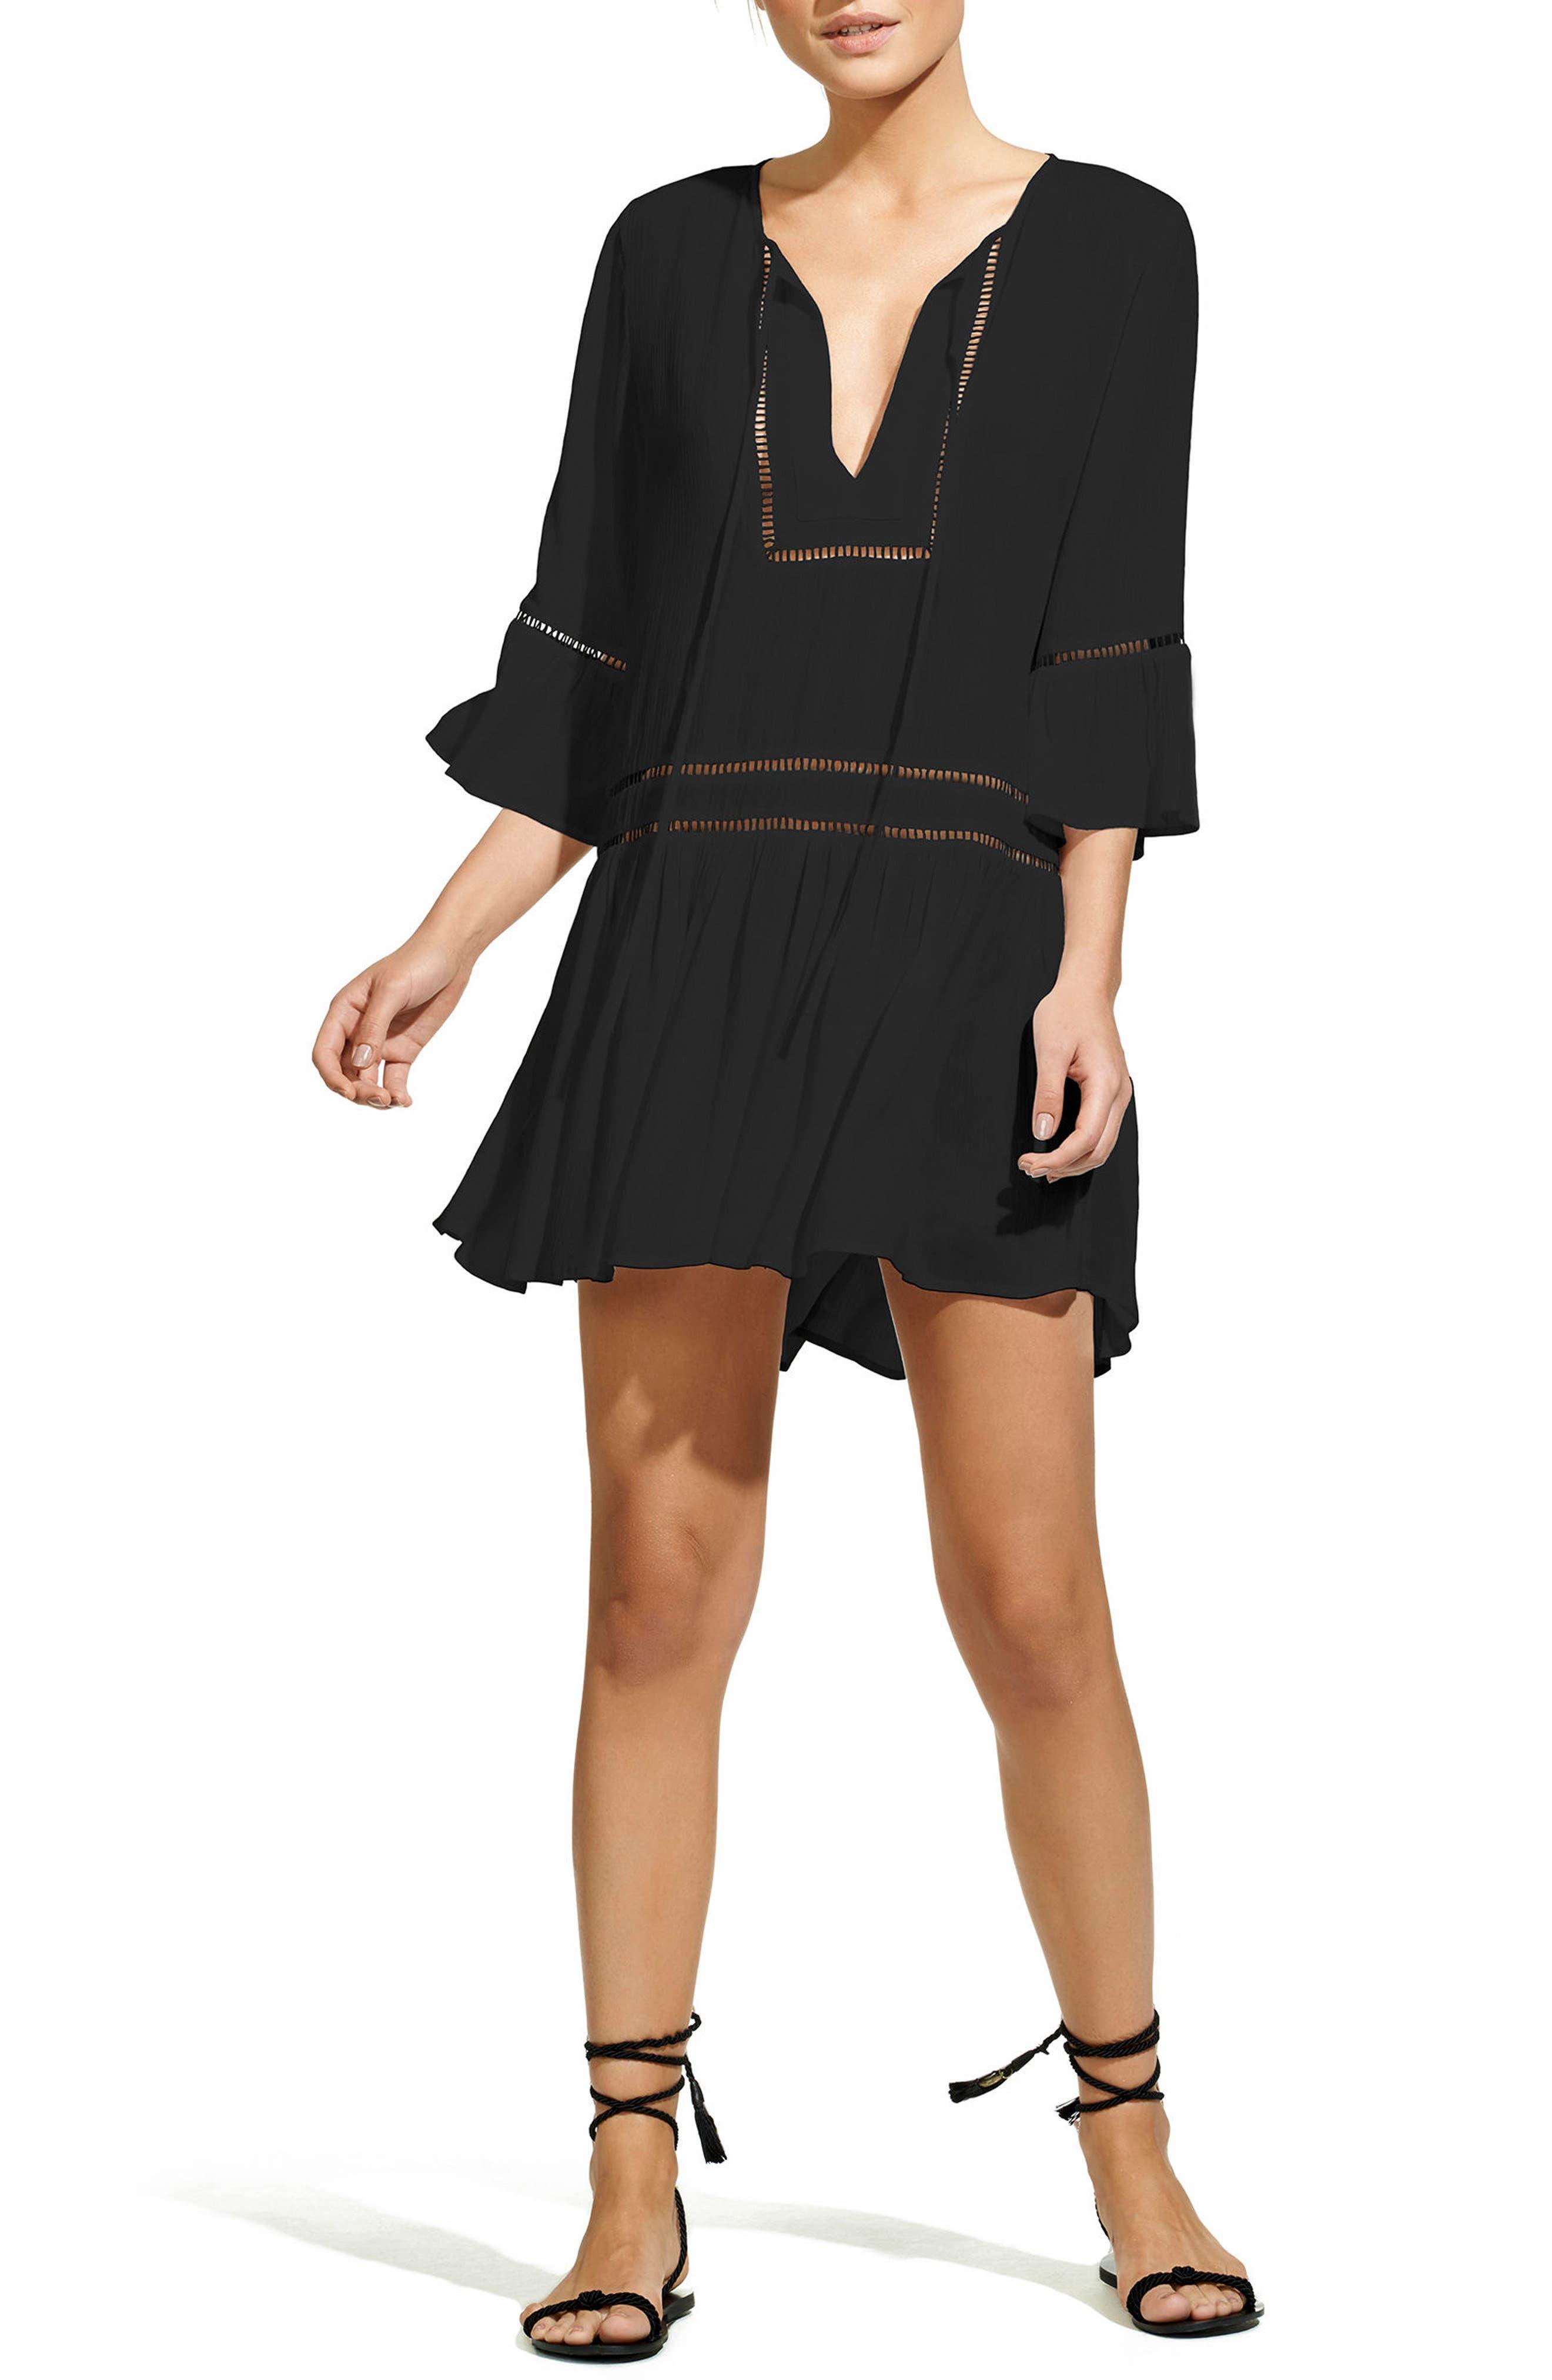 VIX SWIMWEAR Agatha Cover-Up Dress, Main, color, 001